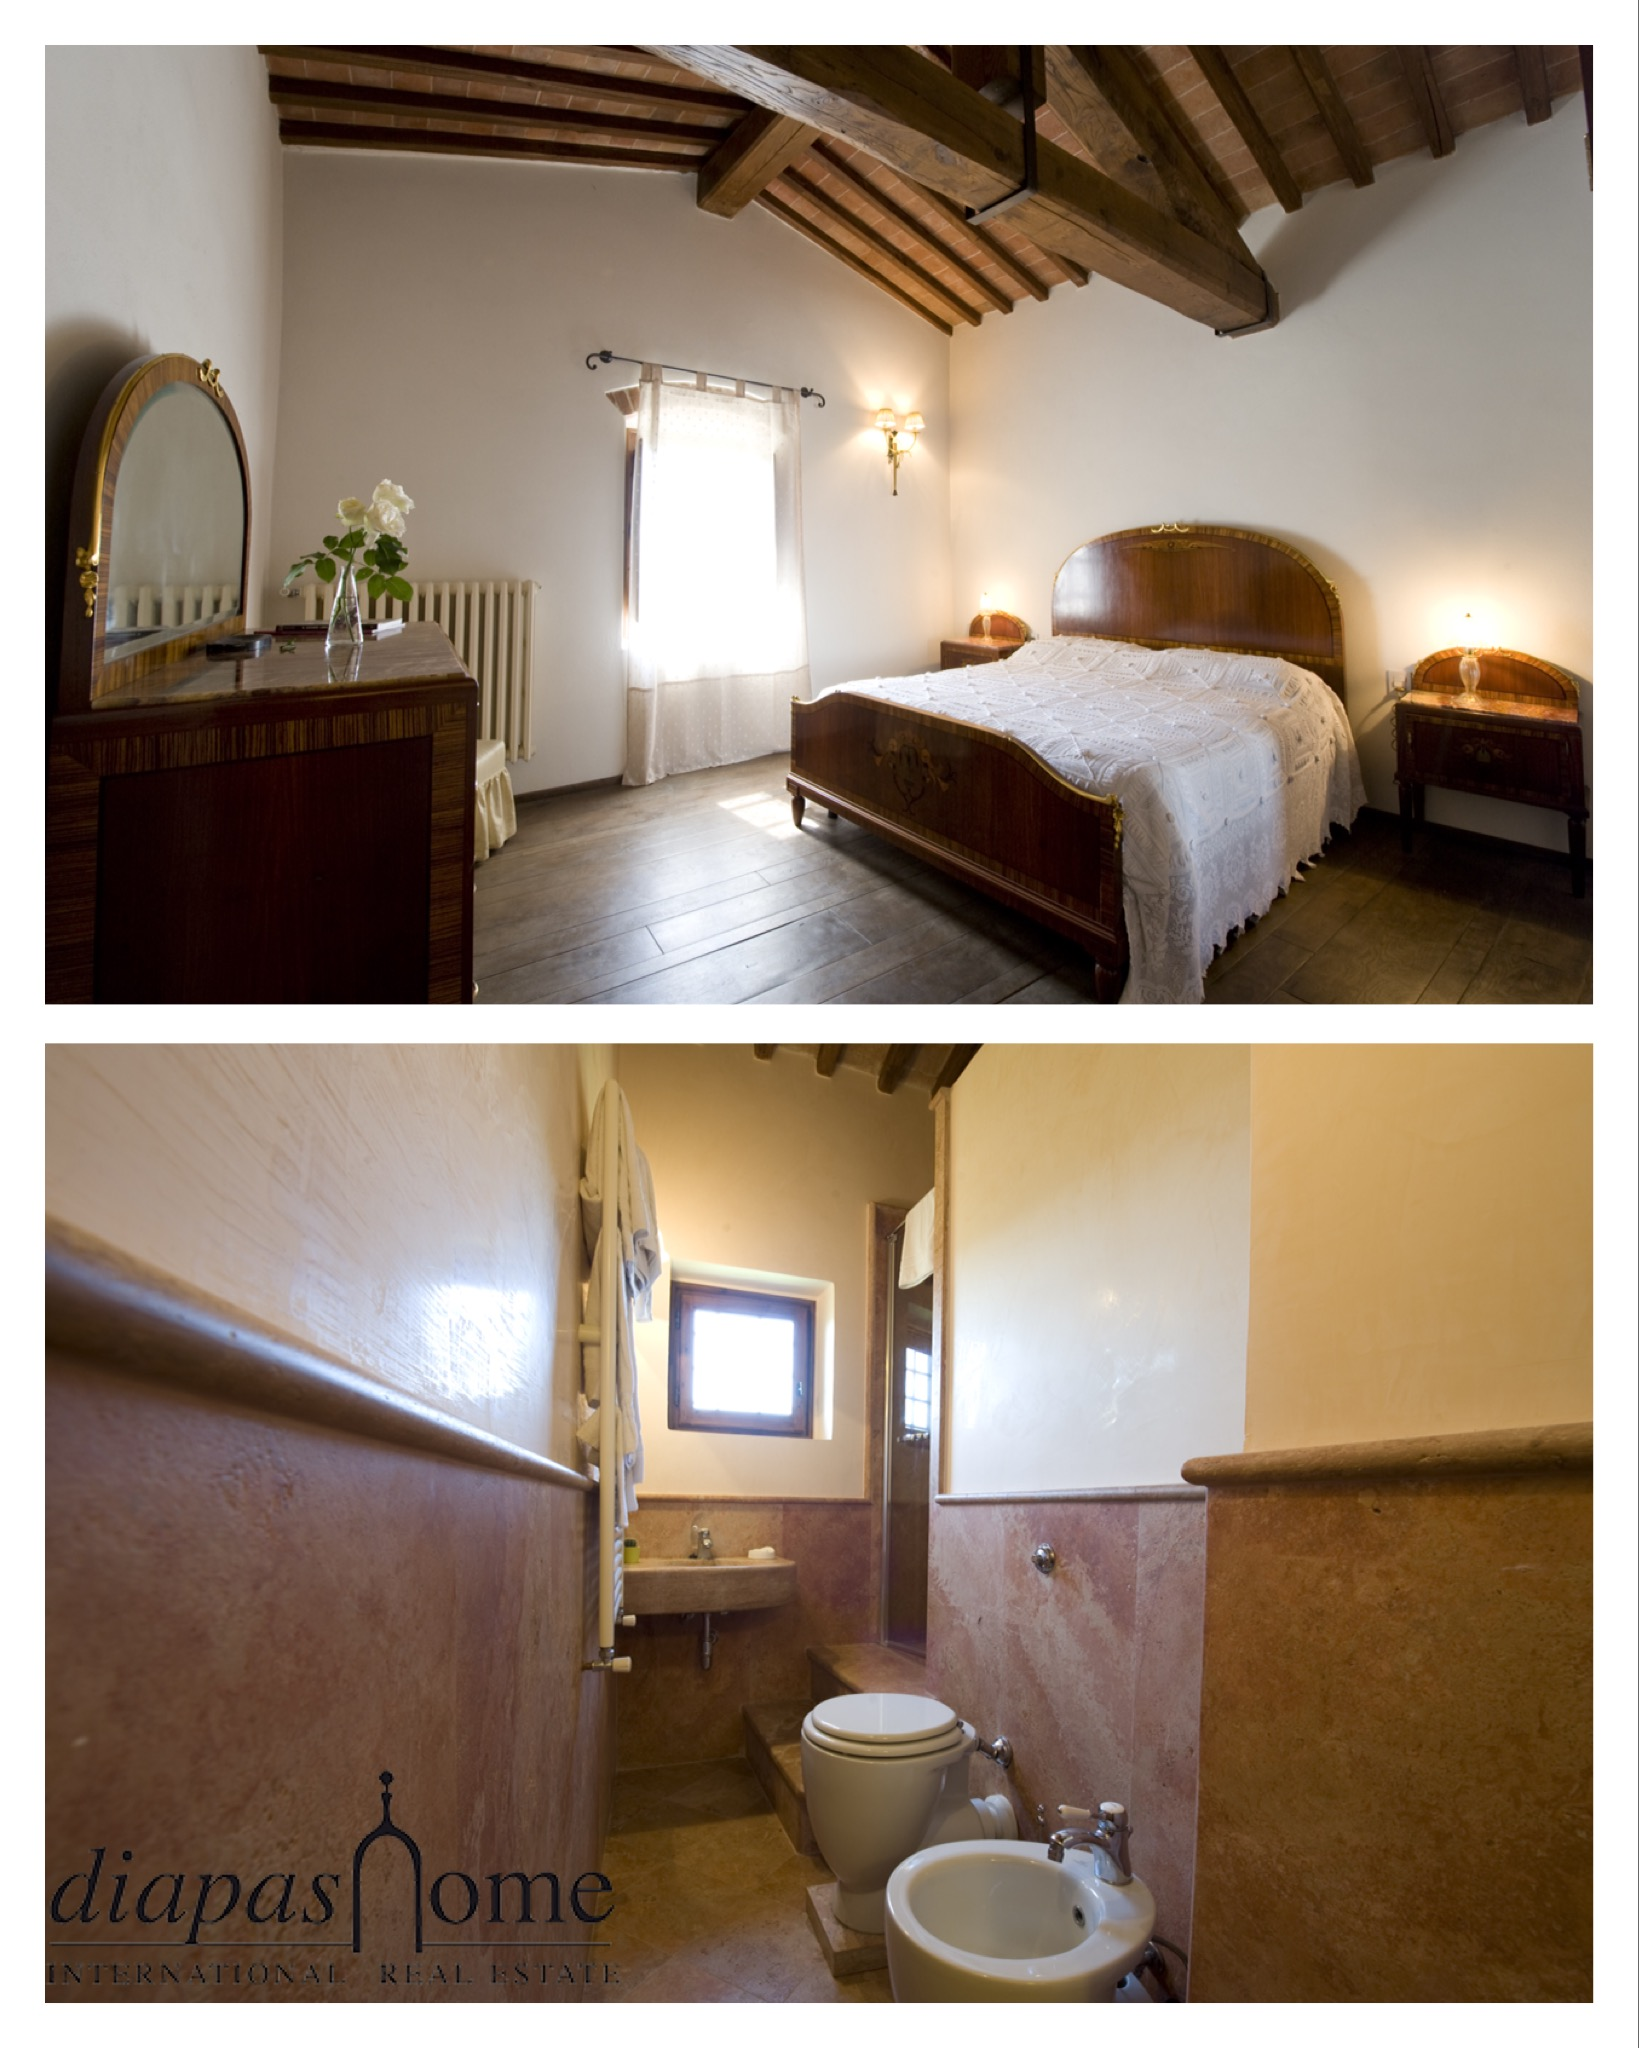 villa, carmignano,diapashome,real,estate_22